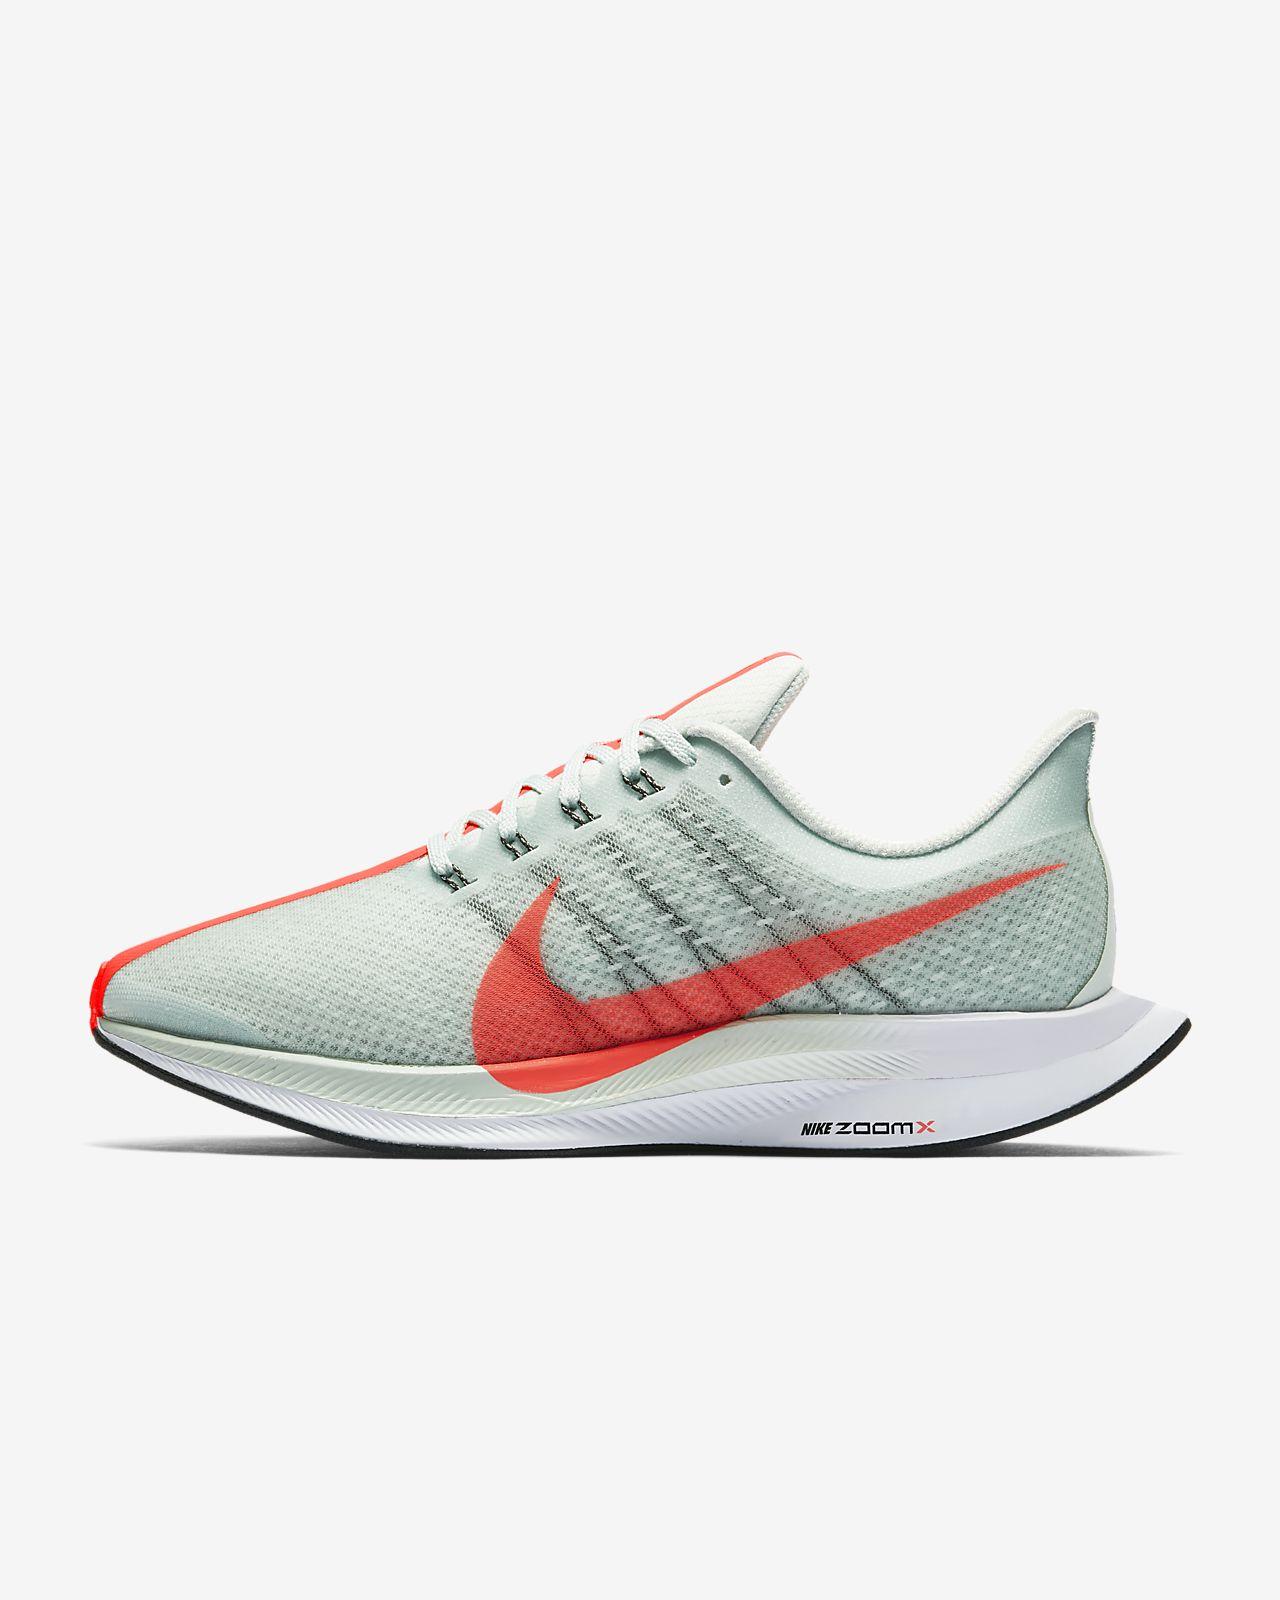 3129b63b7 Nike Zoom Pegasus Turbo Zapatillas de running - Mujer. Nike.com ES